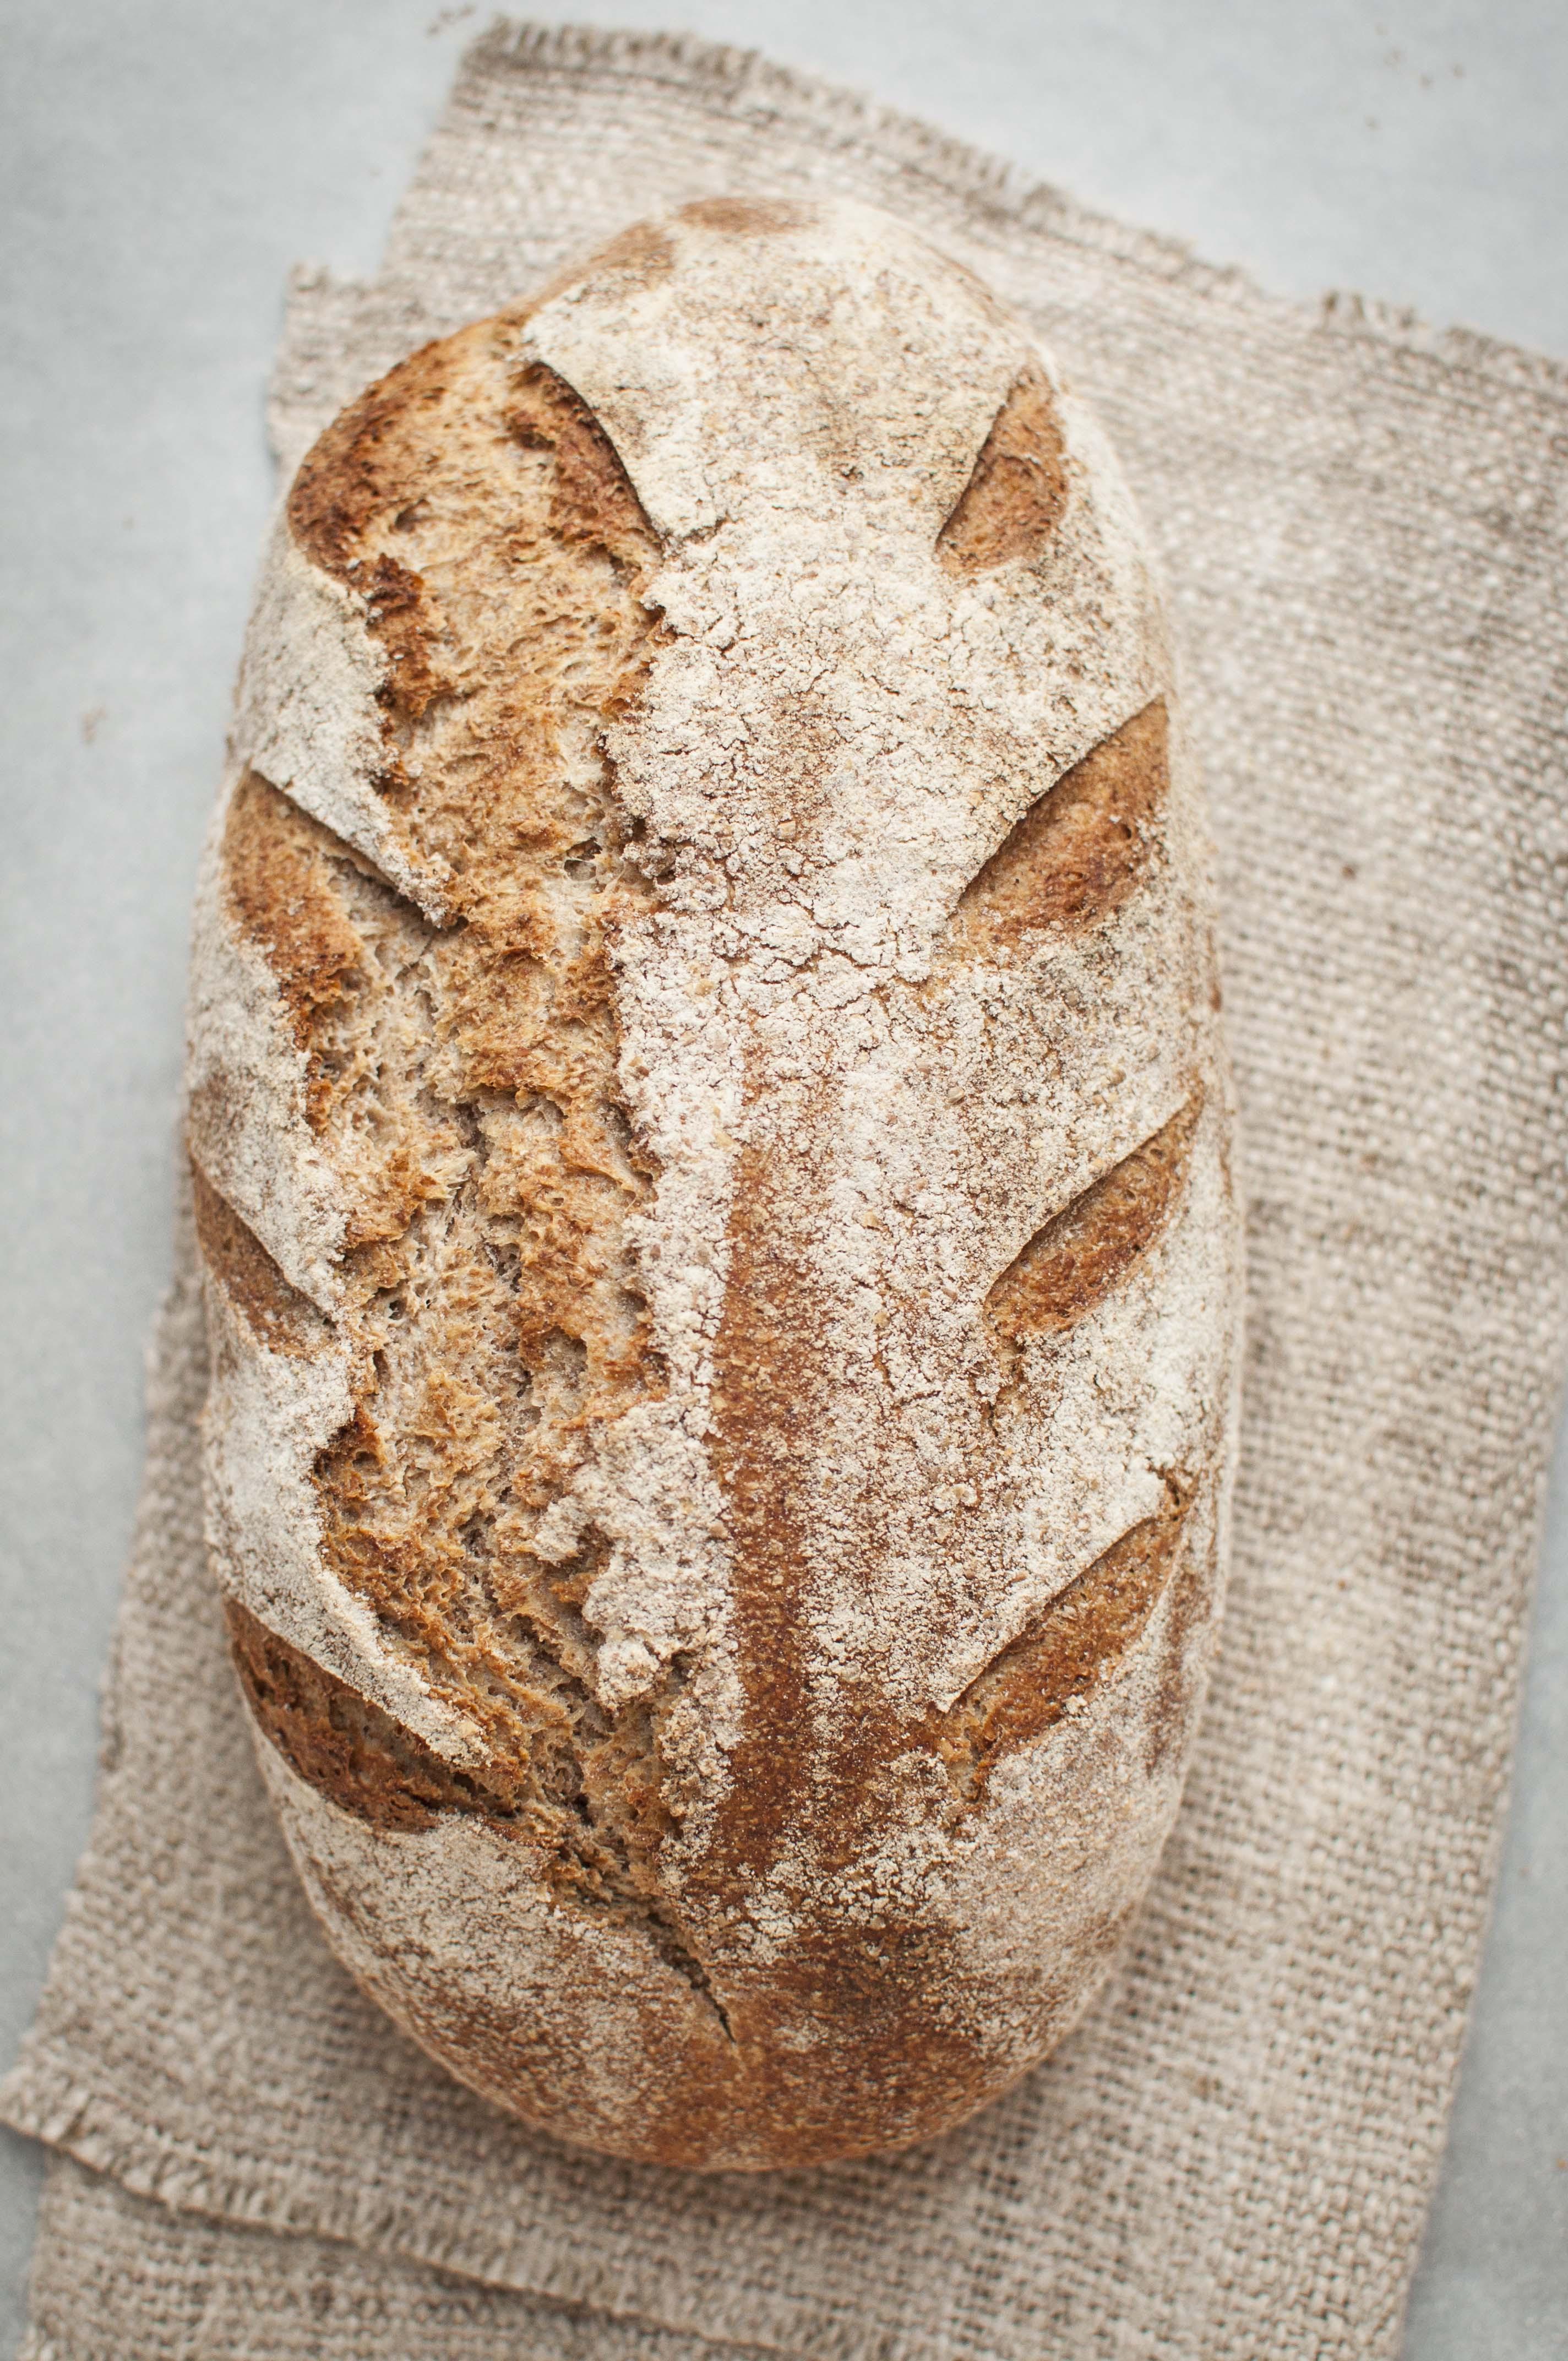 Whole Grain Sourdough Bread  Whole grain wheat sourdough loaf